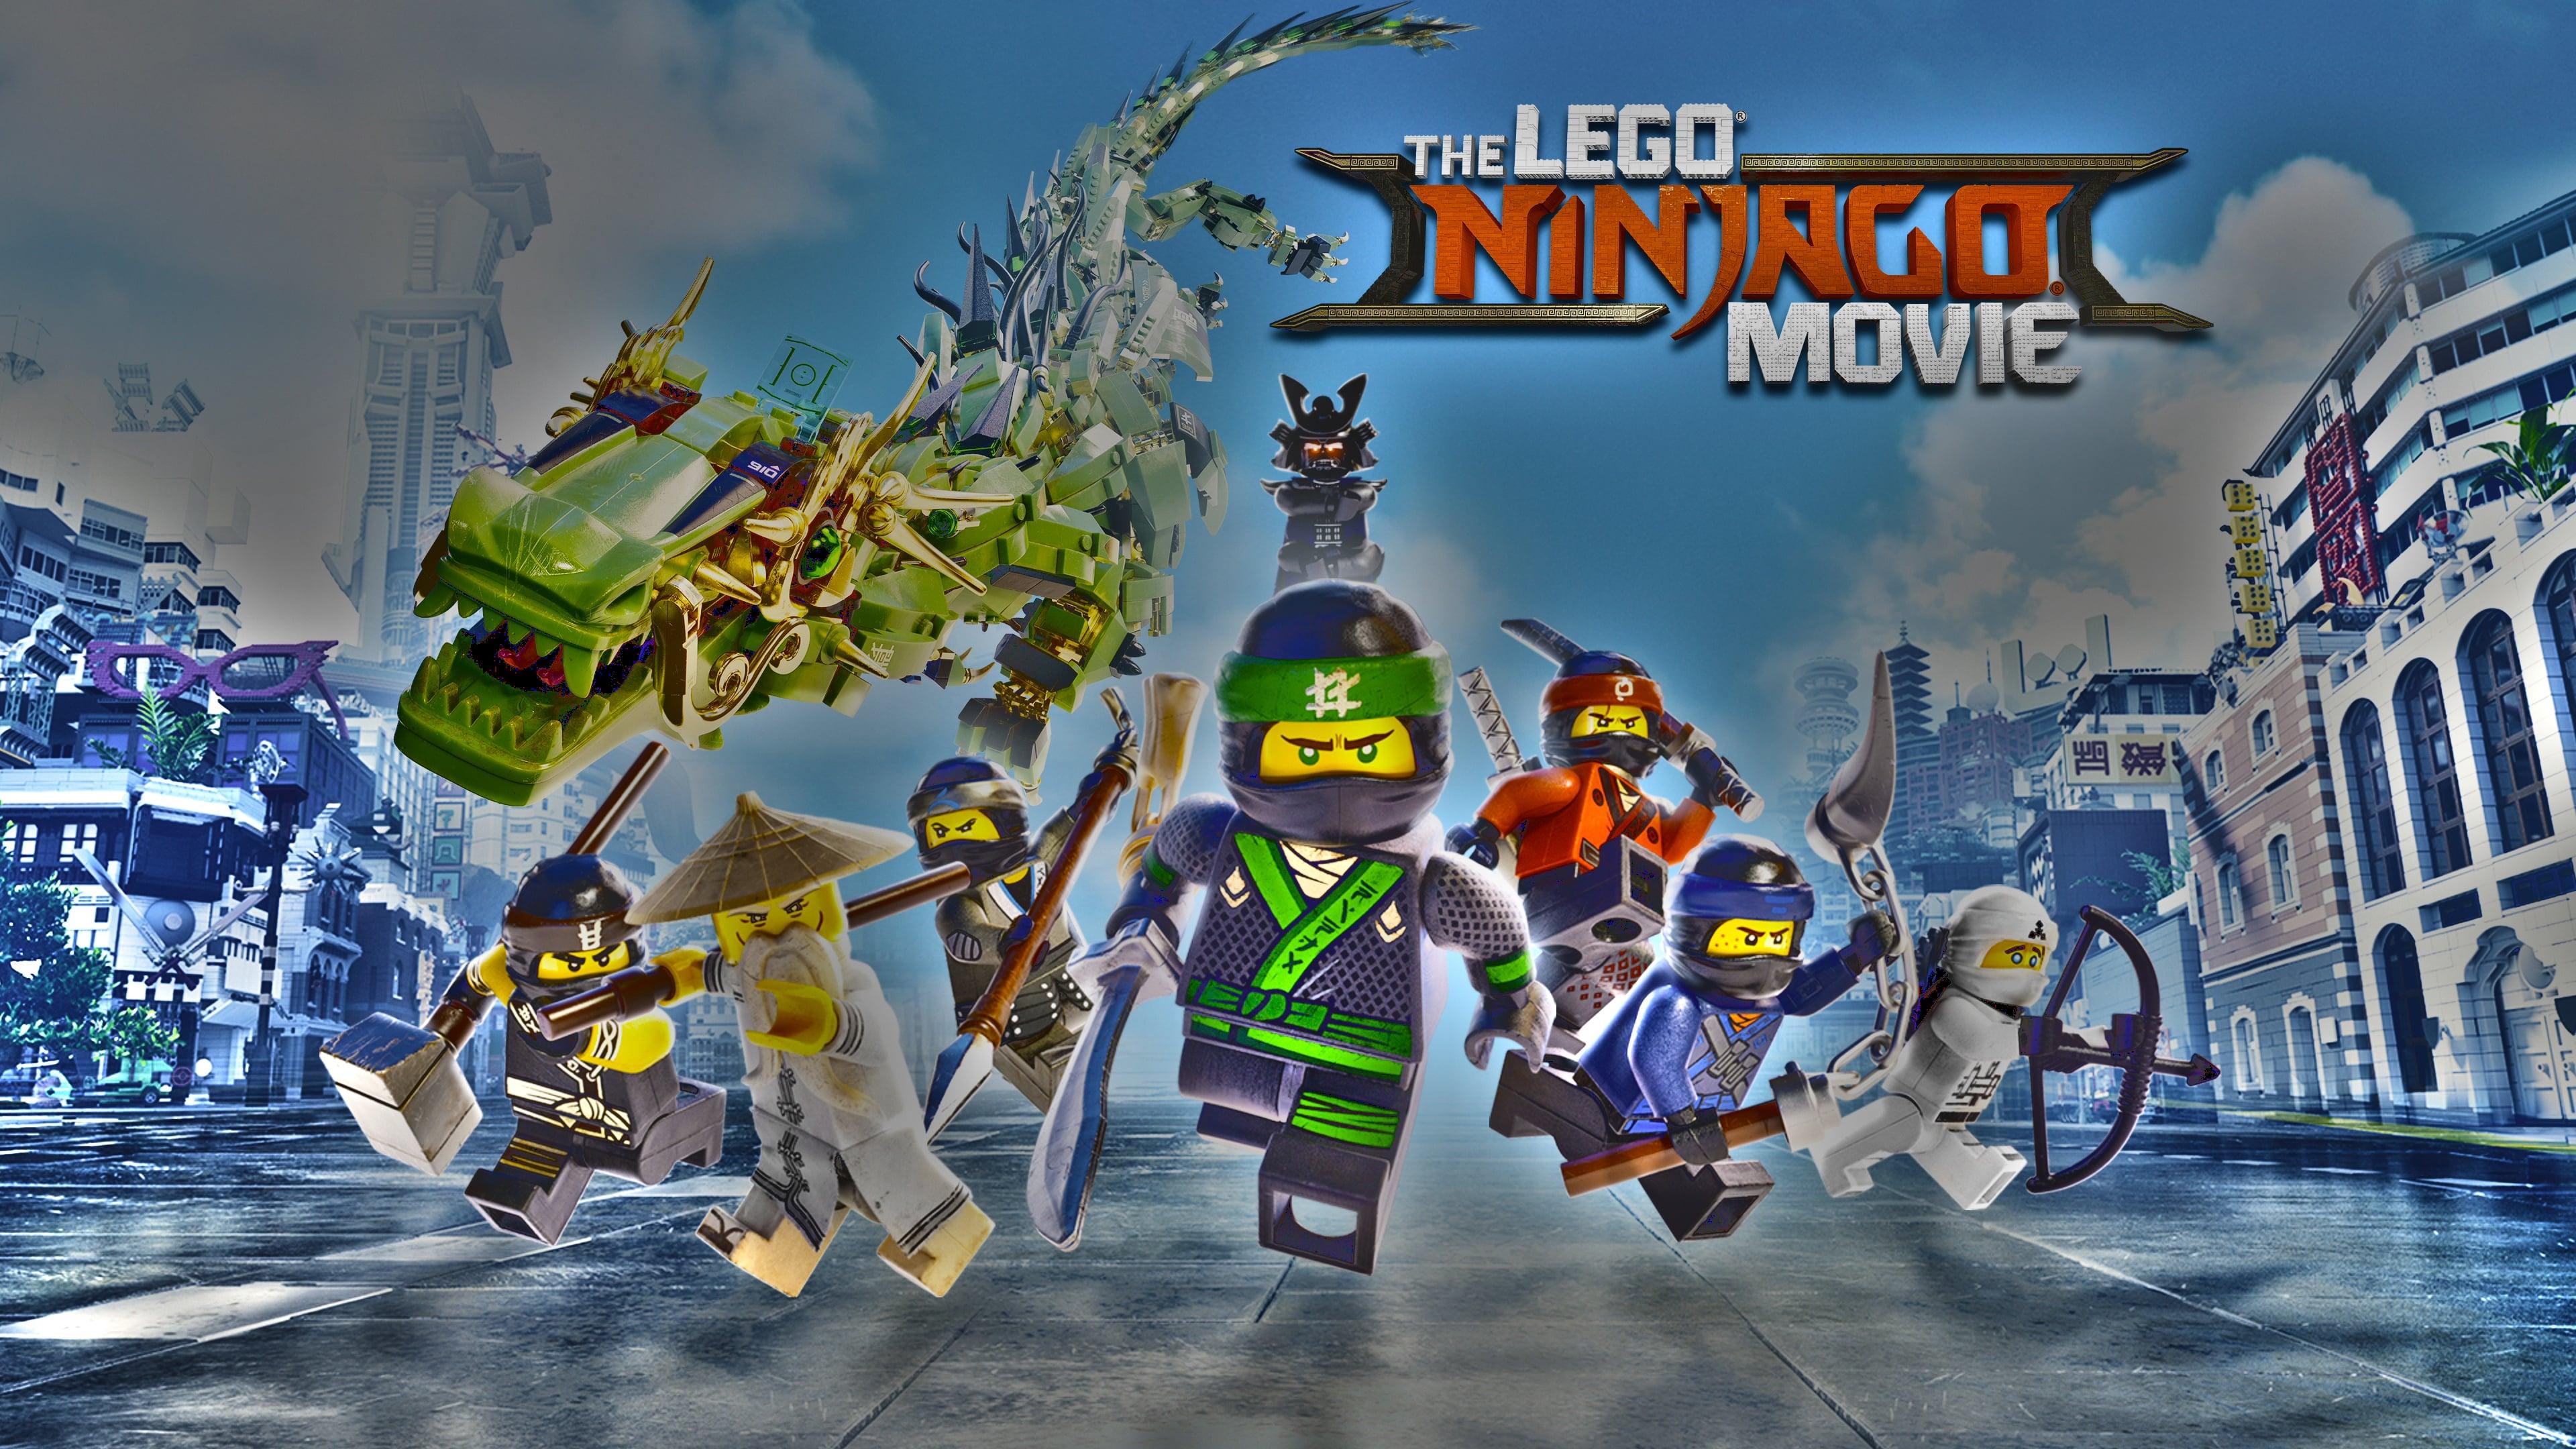 Watch The Lego Ninjago Movie 1st Movie Amp Tv Shows